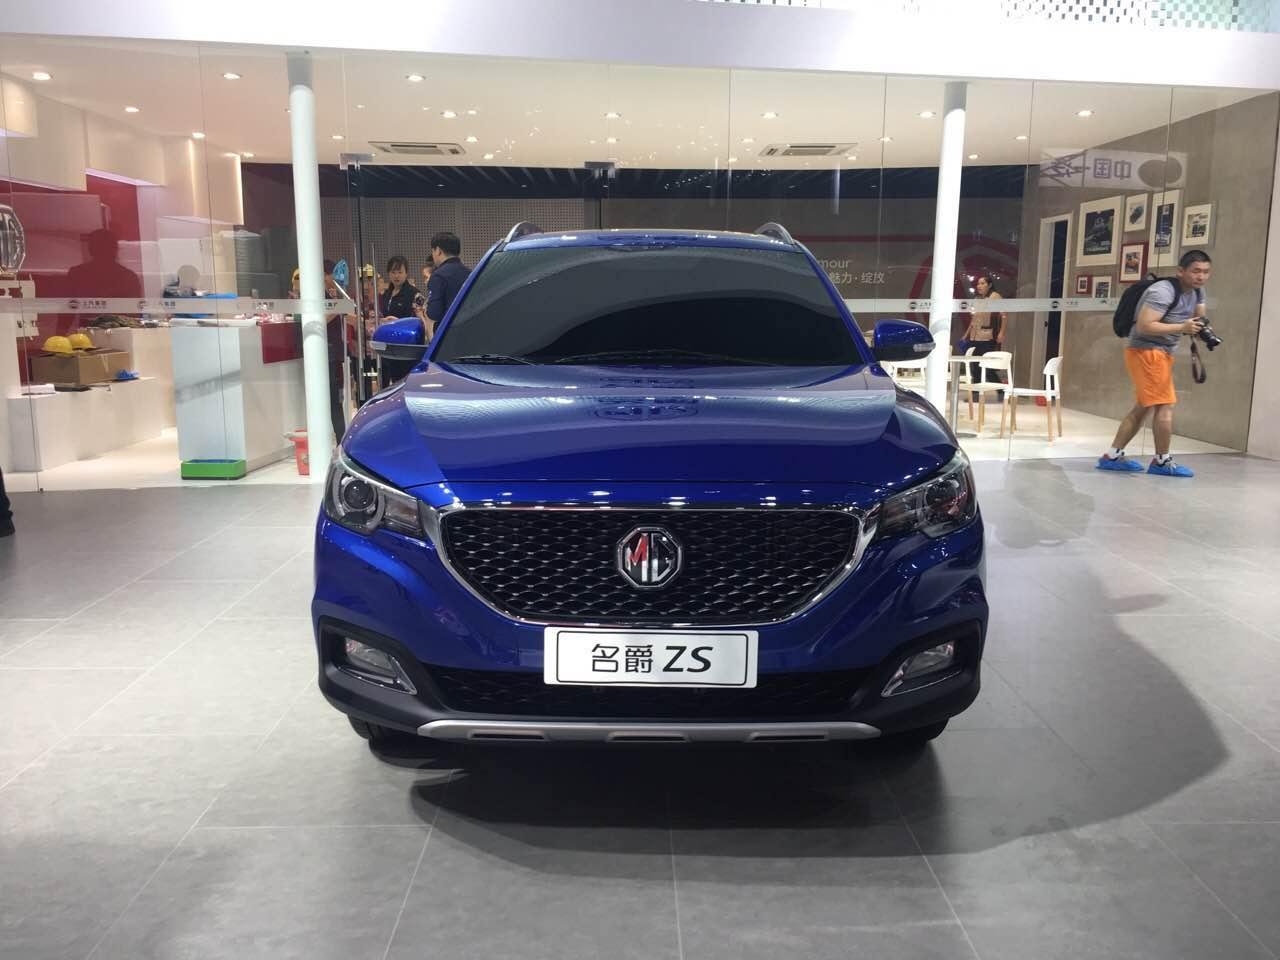 2018 - [SAIC/MG] ZS B-SUV Autohomecar__wKgH6Fgr7oKAUMyHAAVUcoo-bCk11